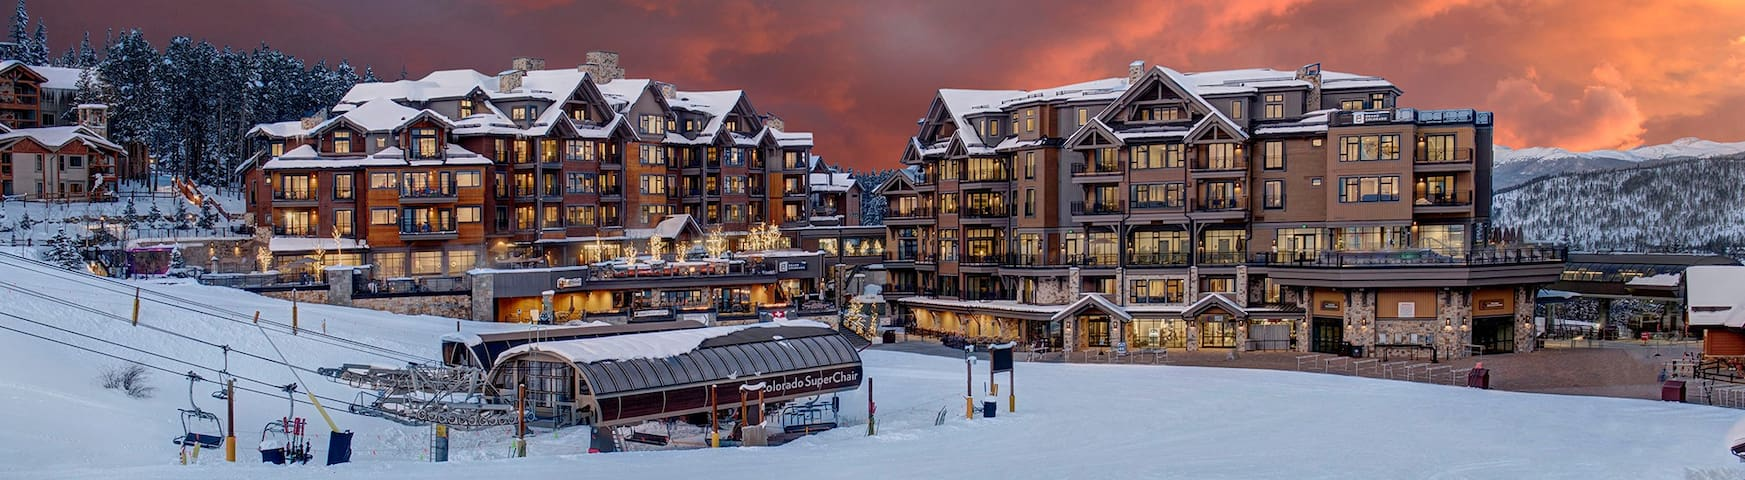 Enjoy the best of Breck! (On Peak 8)